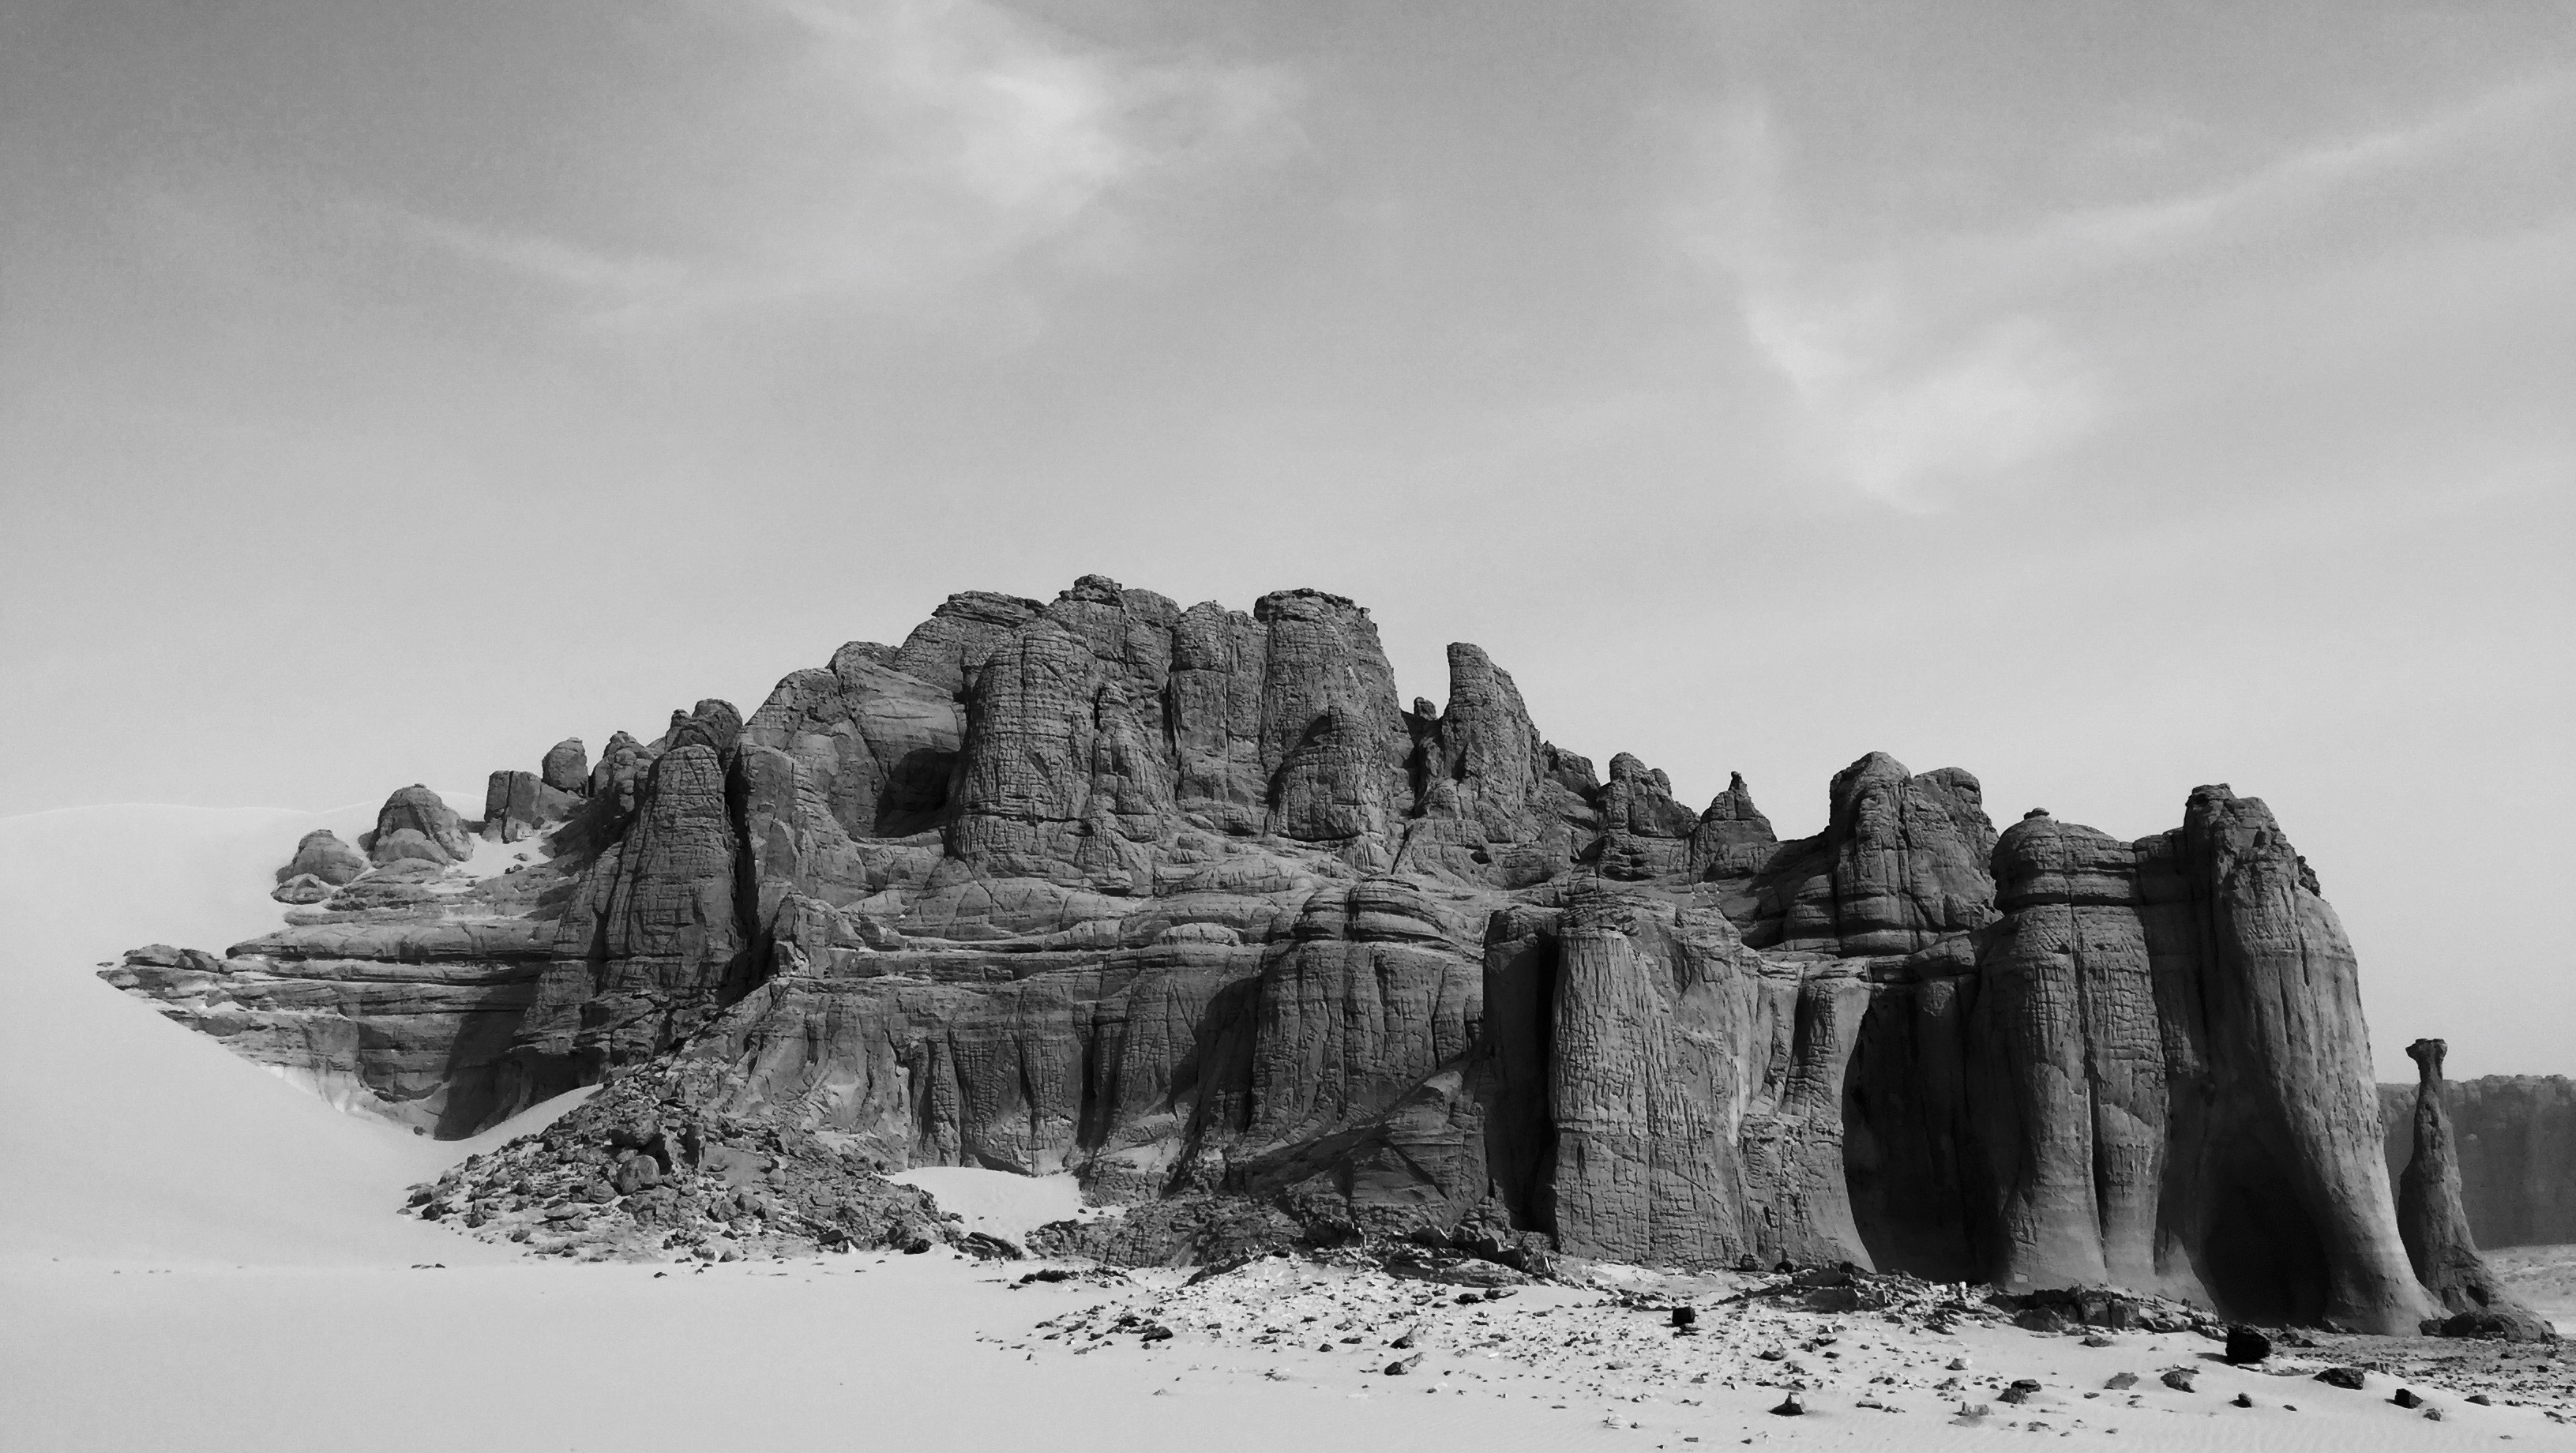 Yacine Bouaziz ~  The Fortress